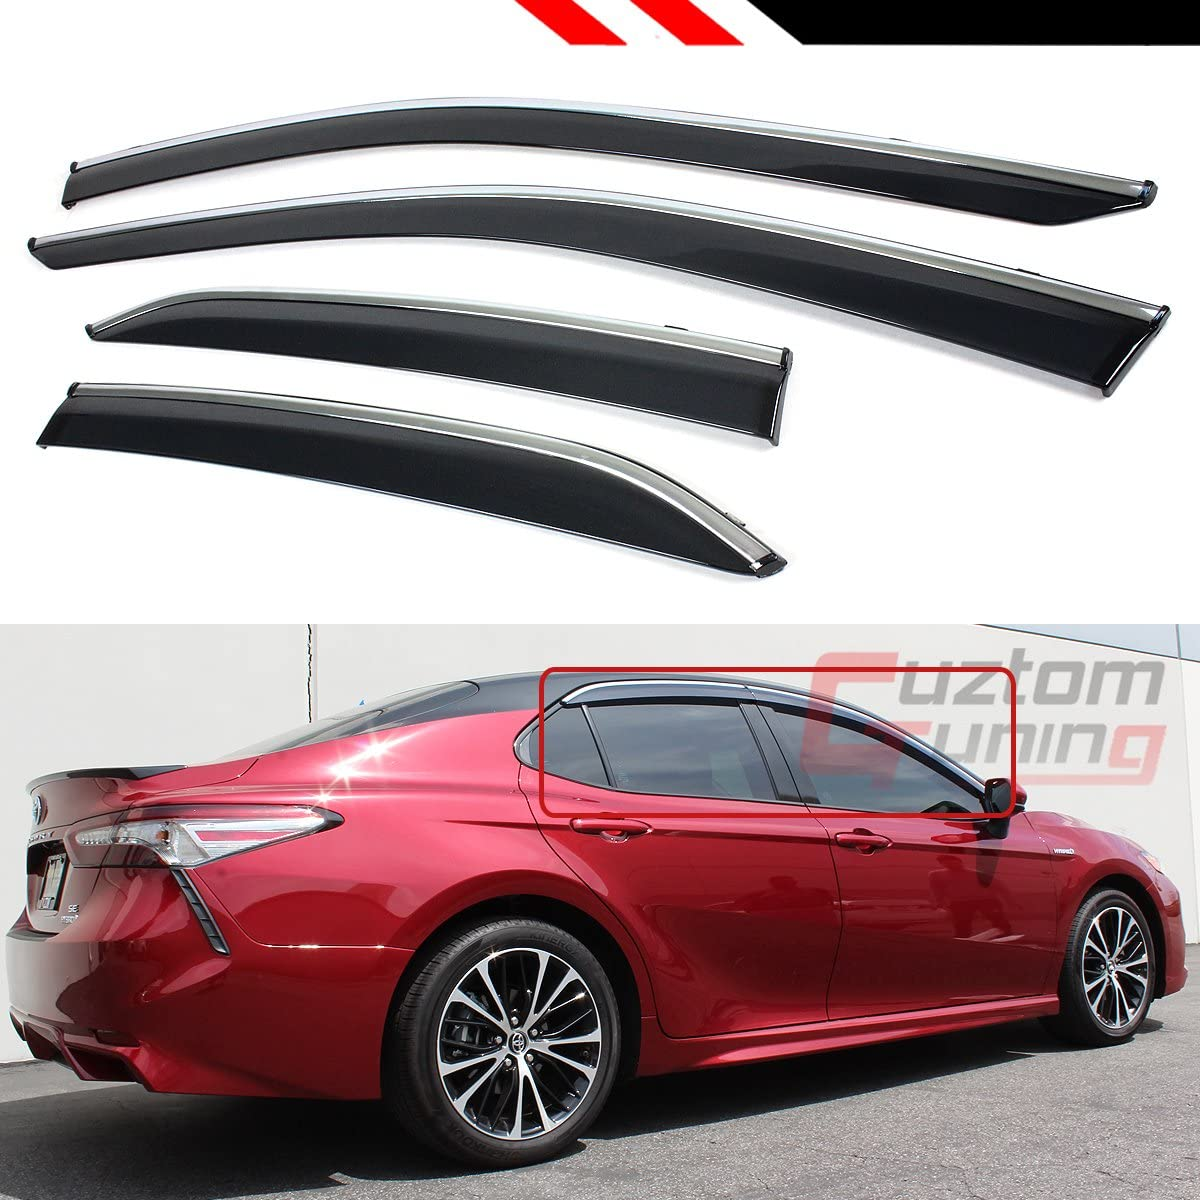 2018 Camry Le >> Fits For 2018 2019 2020 Toyota Camry Le Xle Se Xse Clip On Type Chrome Trim Window Visor Rain Guard Deflector